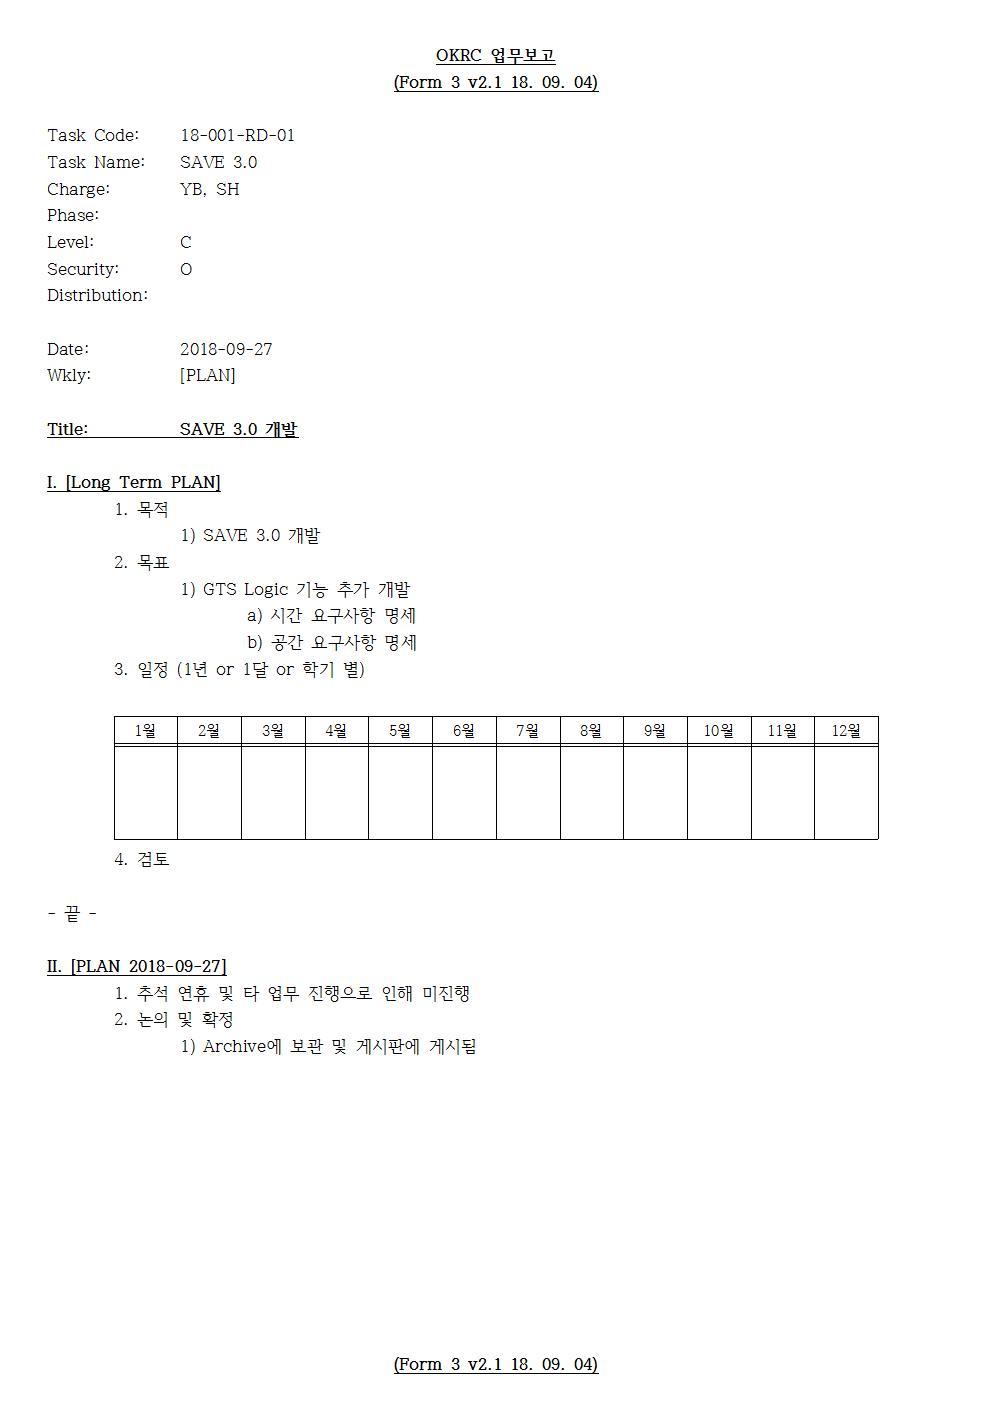 D-[18-001-RD-01]-[SAVE 3.0]-[2018-09-27][SH]001.jpg